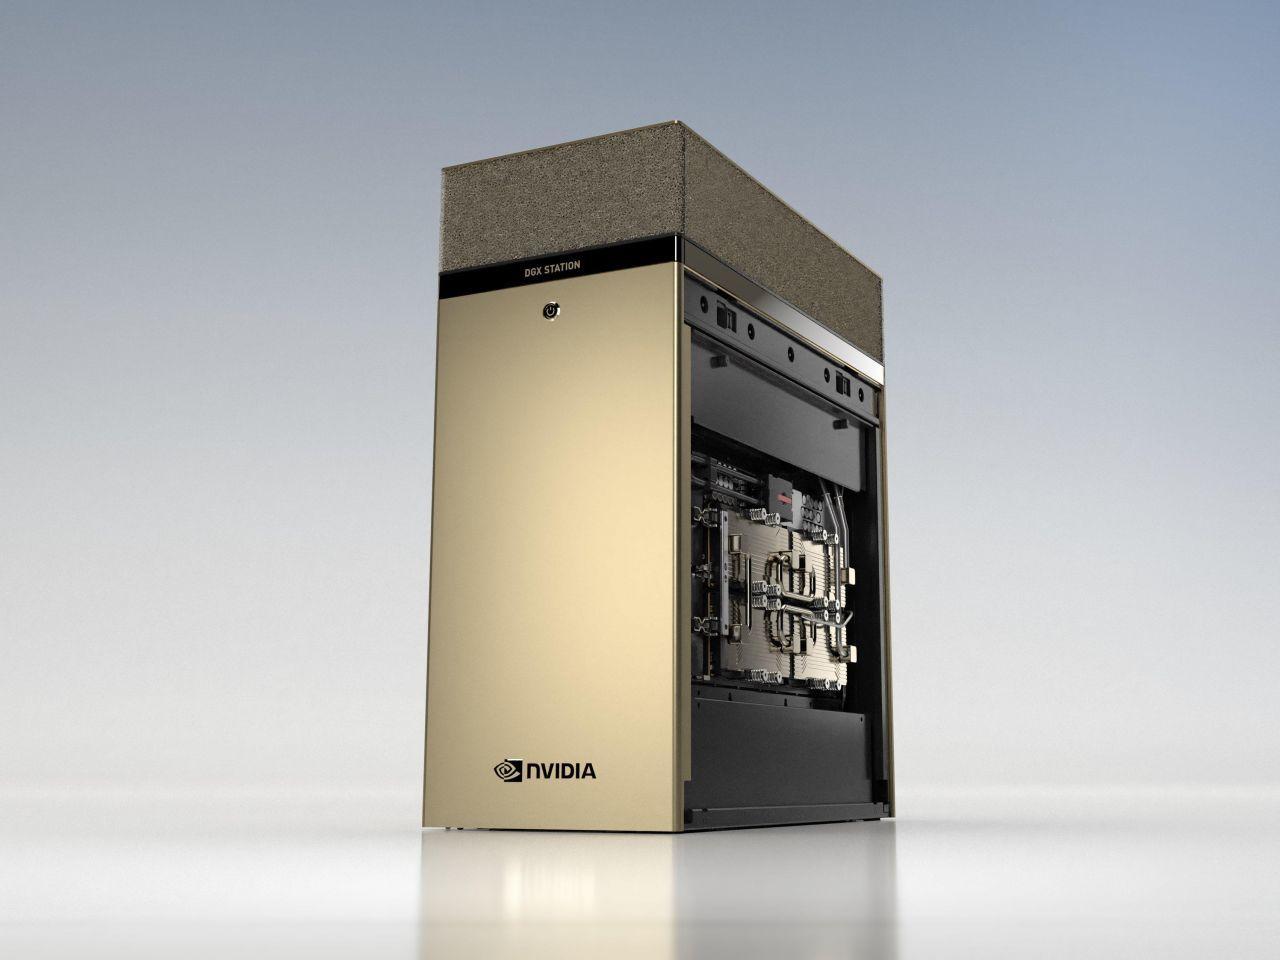 NVIDIA、新AIワークステーション「DGX Station A100」発表 - ZDNet Japan